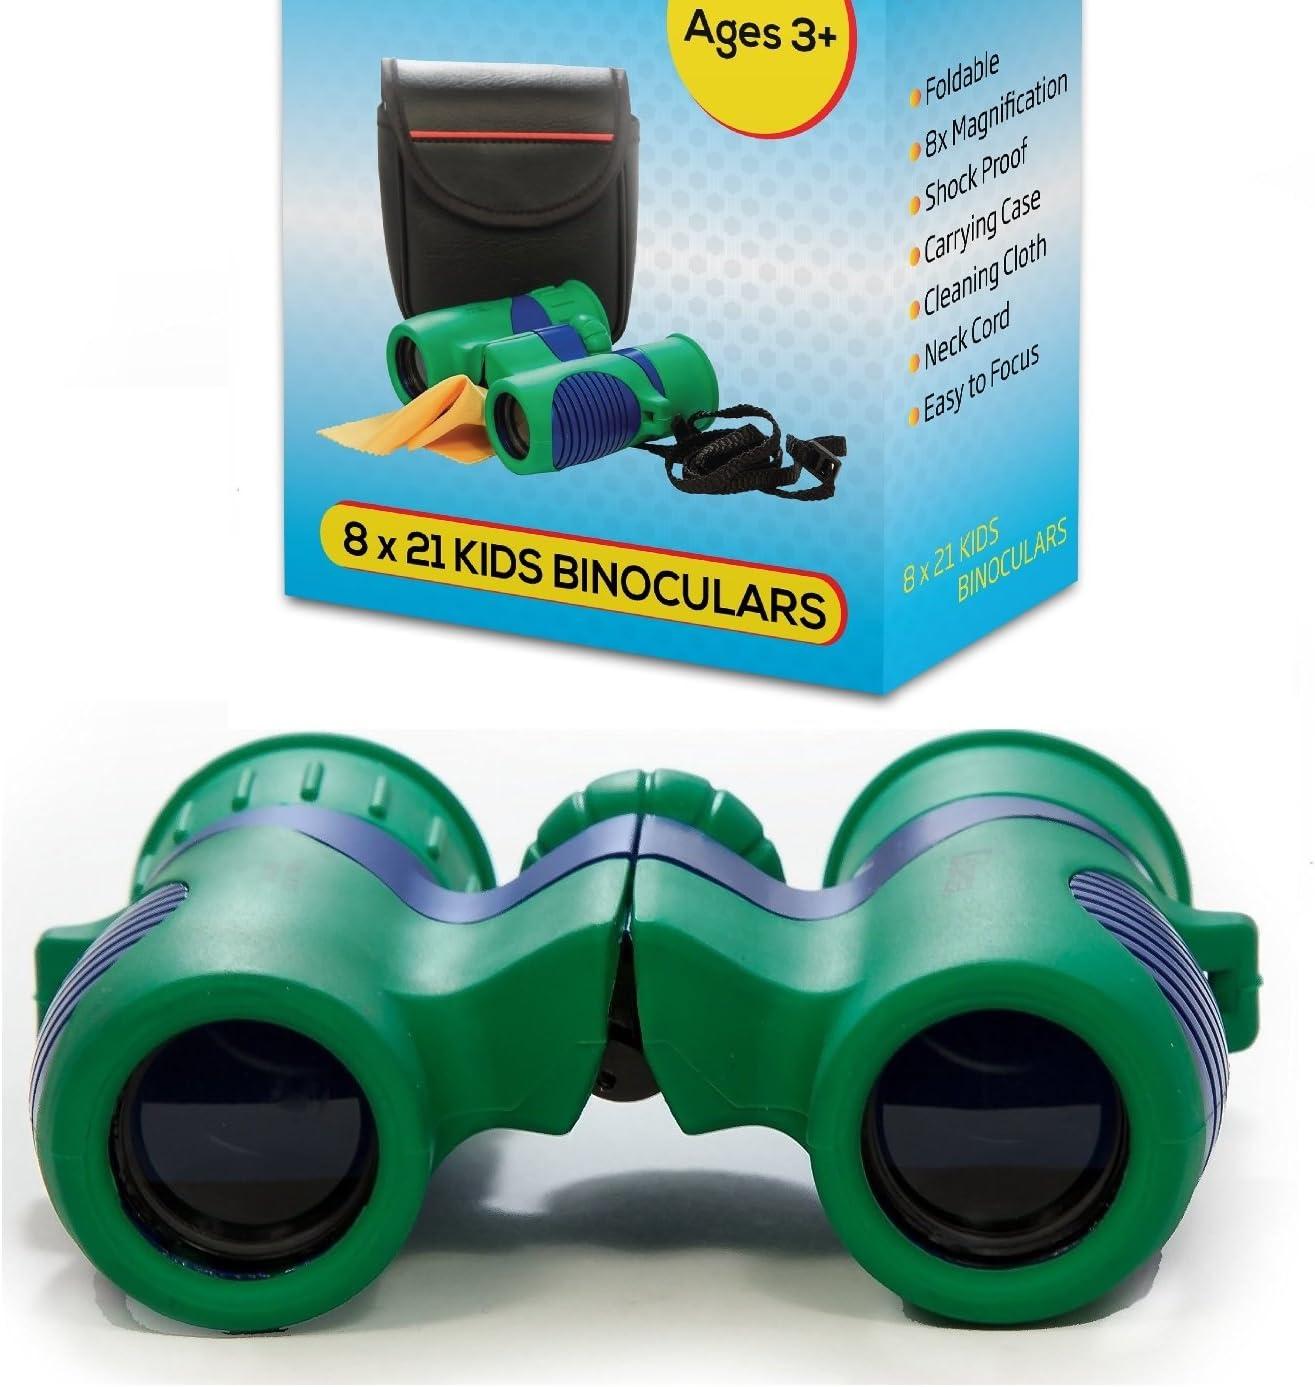 Top 9 Best Spy Kit For Kids (2020 Reviews) 4